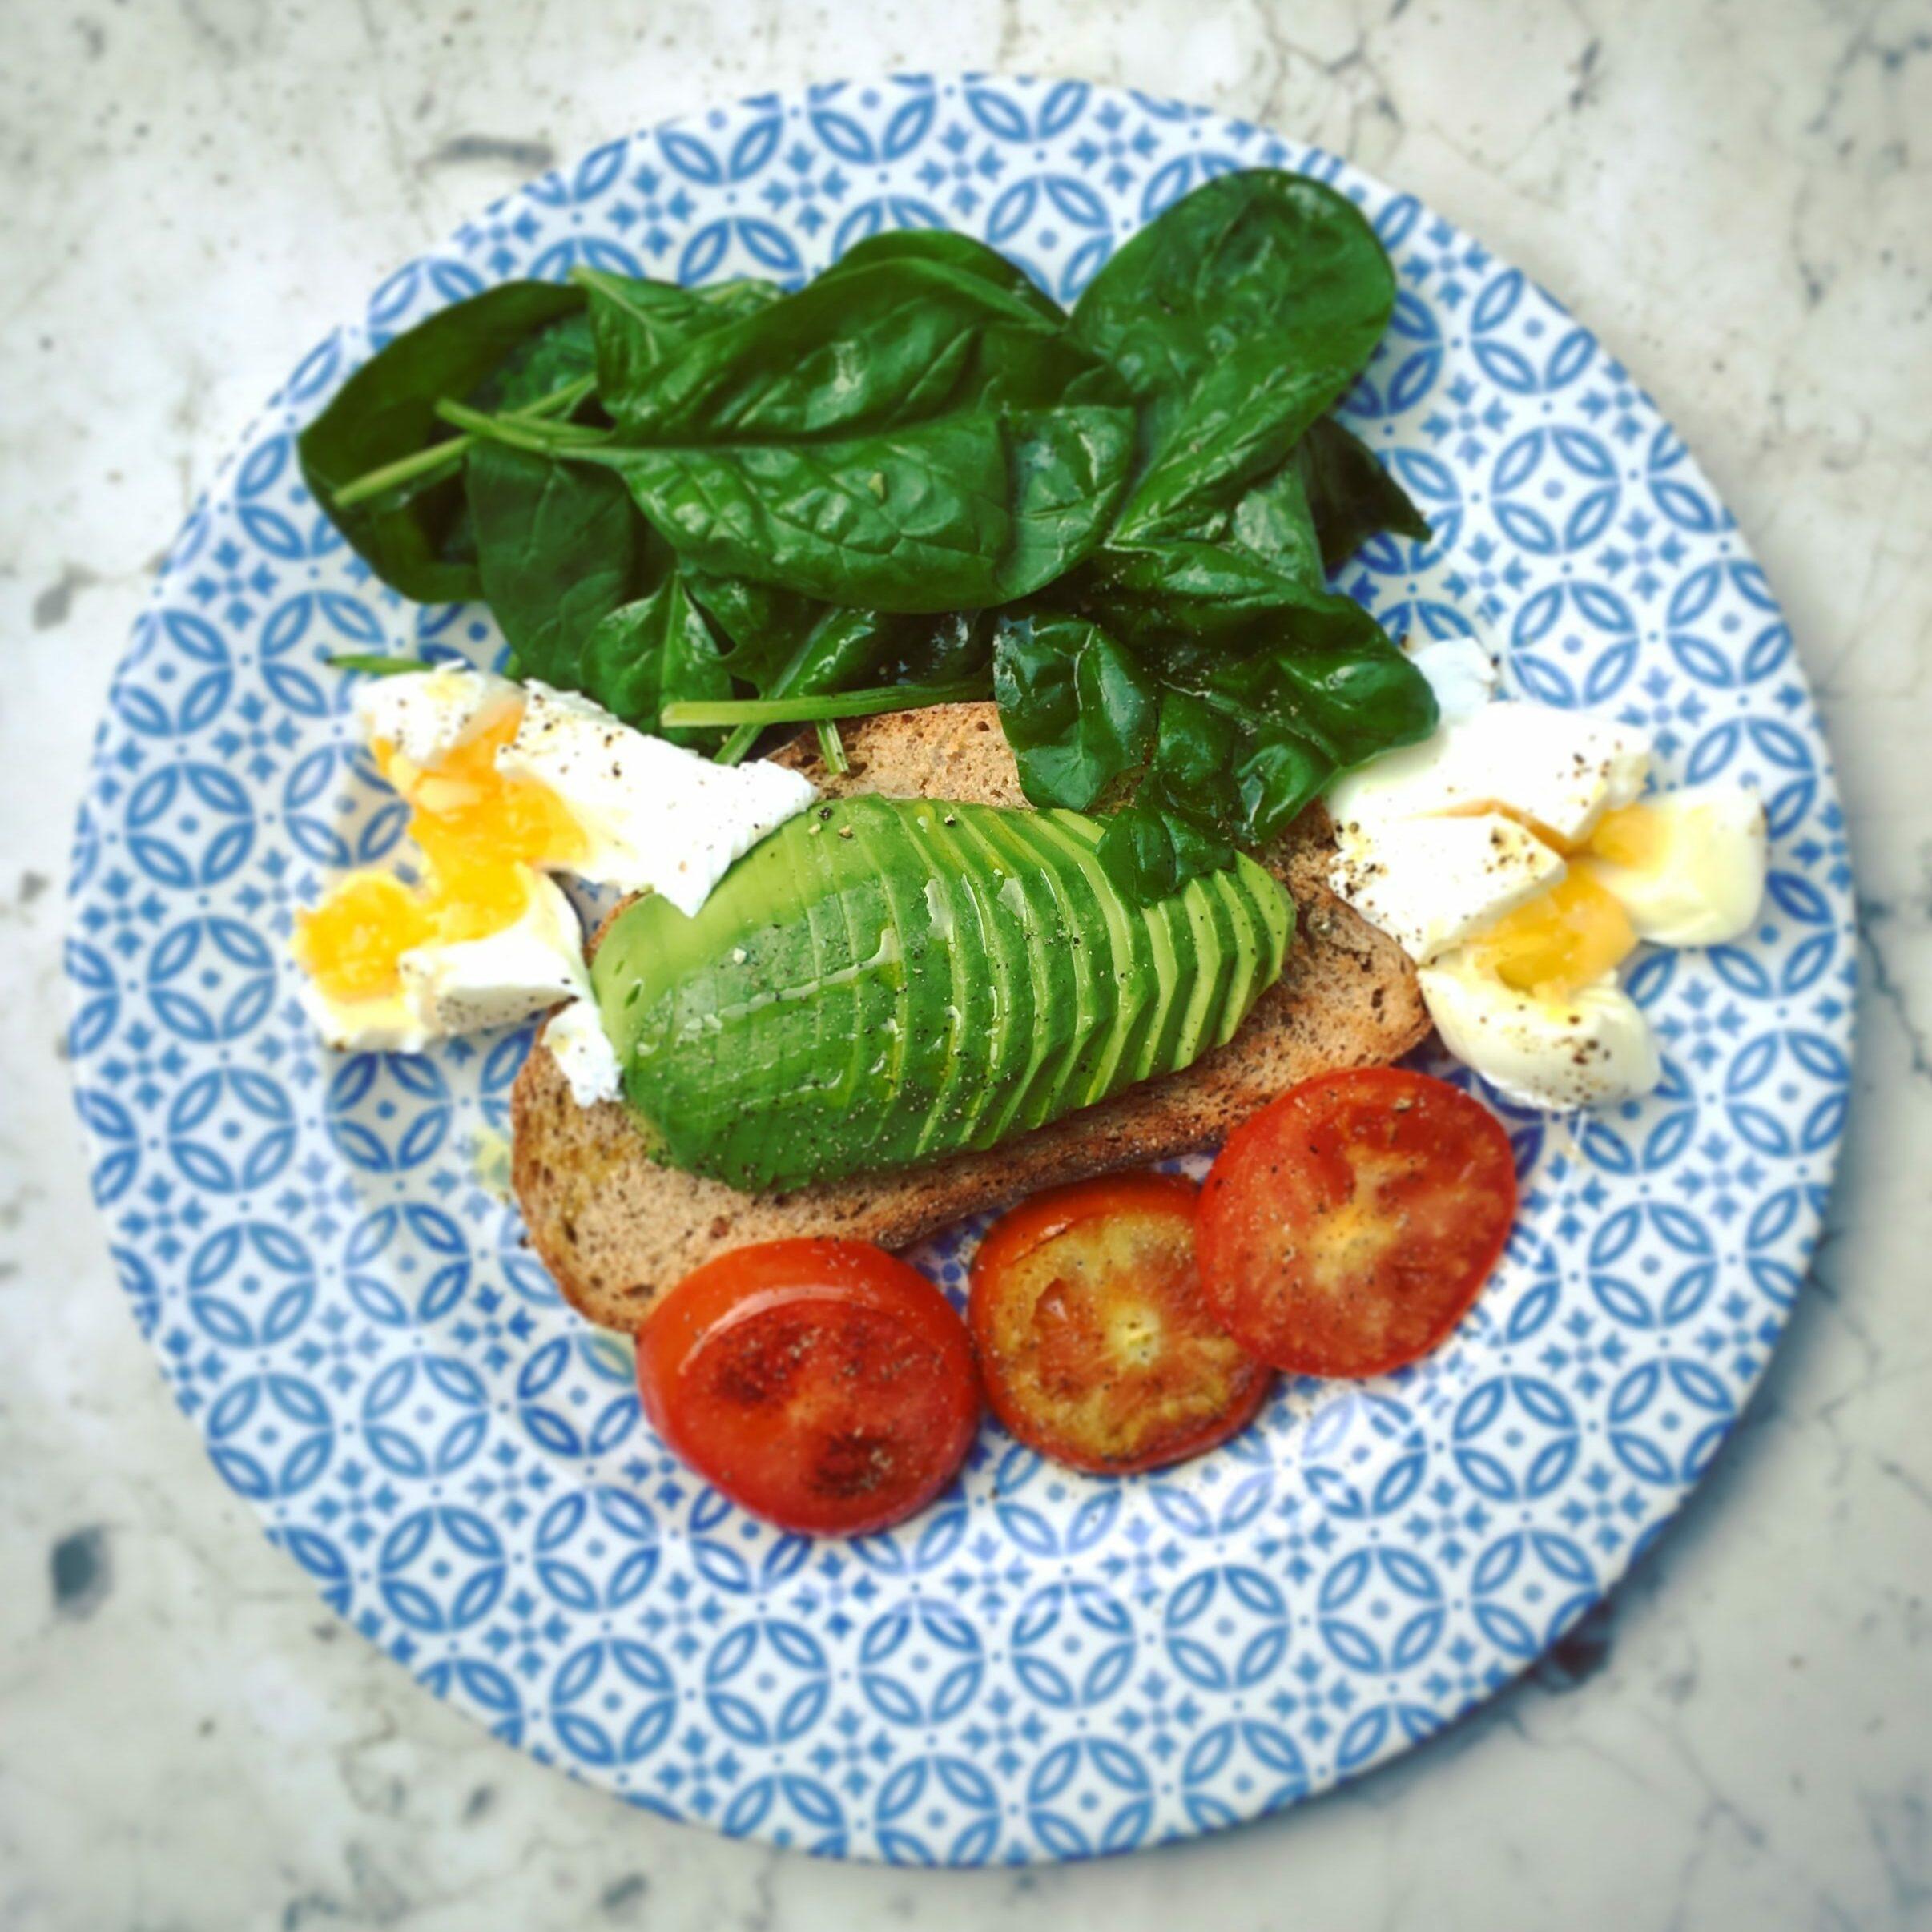 Breakfast with avocado etc